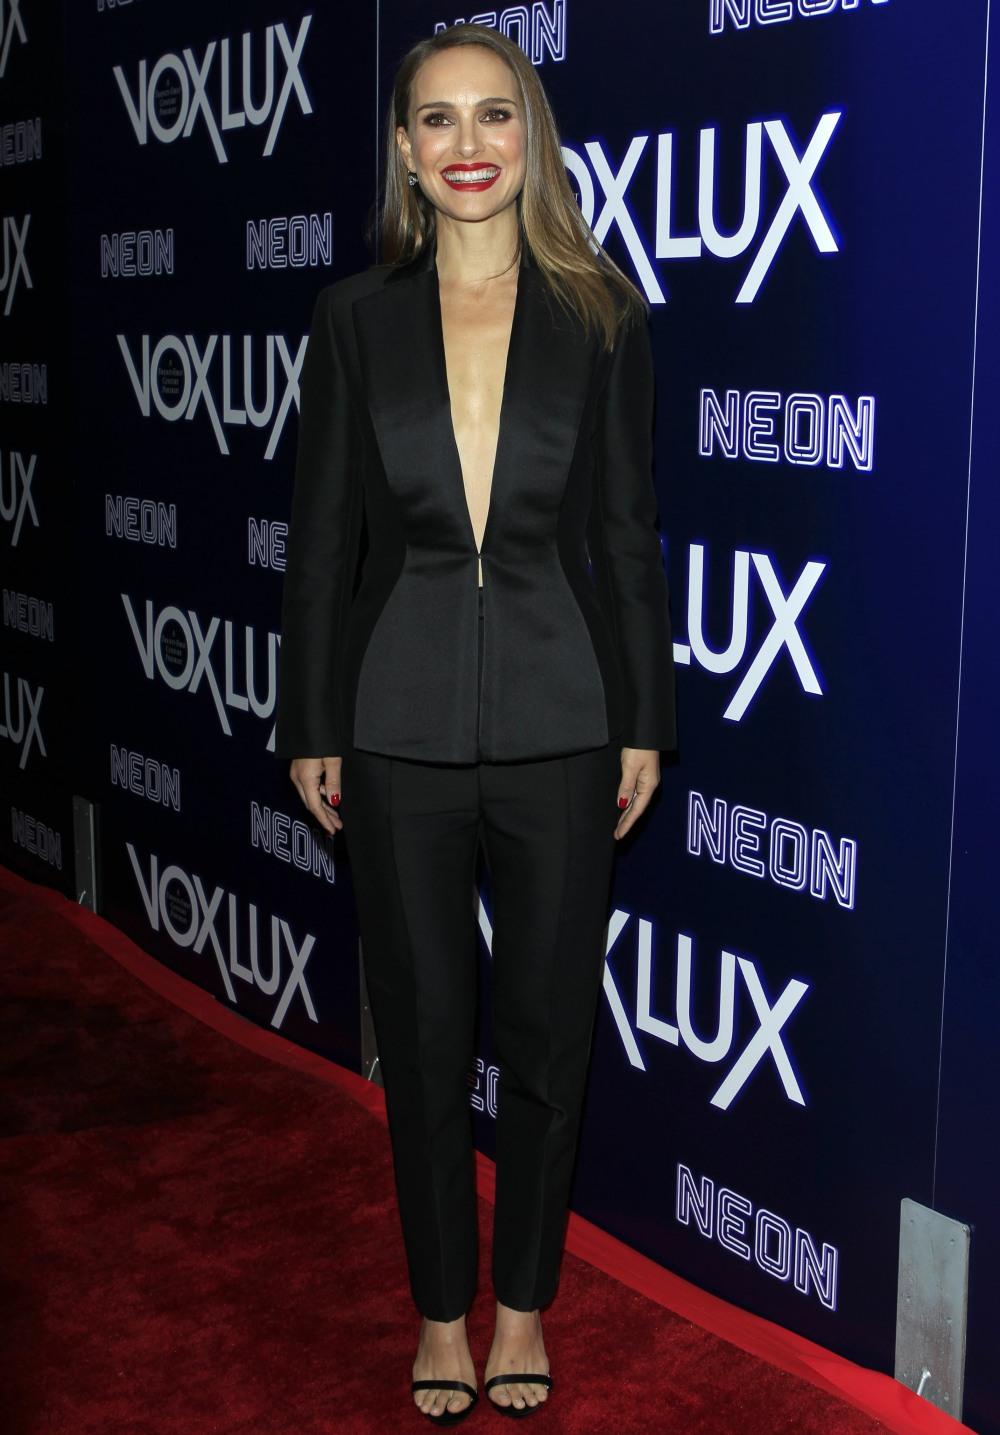 Premiere of Neon's 'Vox Lux' - Arrivals